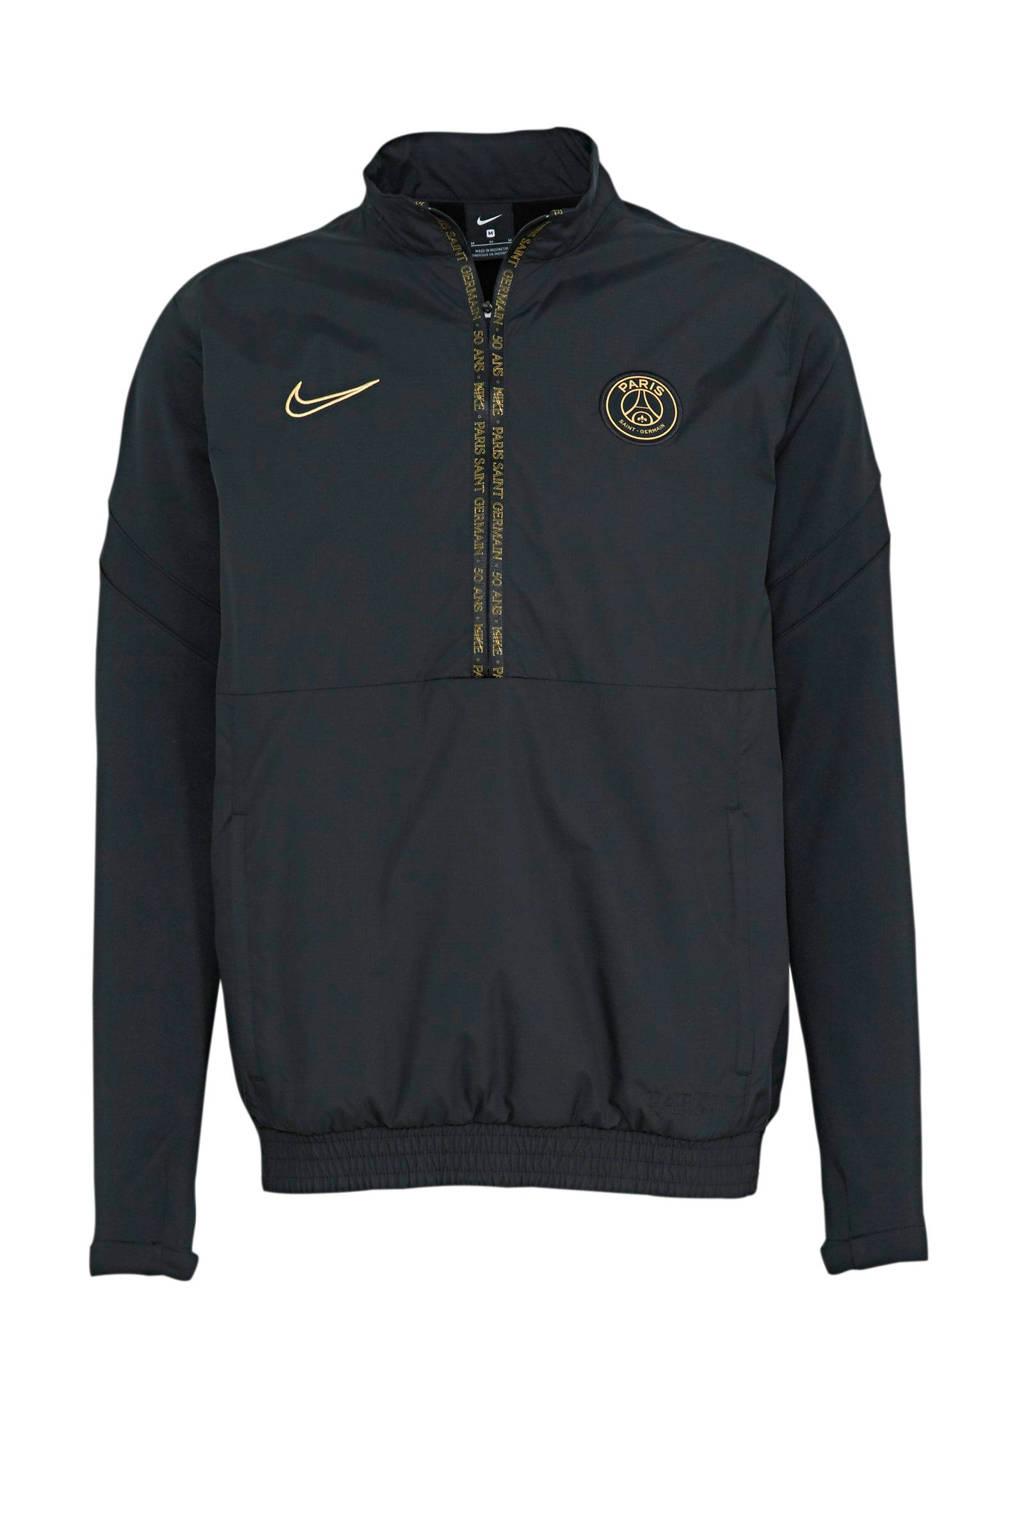 Nike Senior Paris Saint Germain Voetbalvest zwart/goud, Zwart/goud